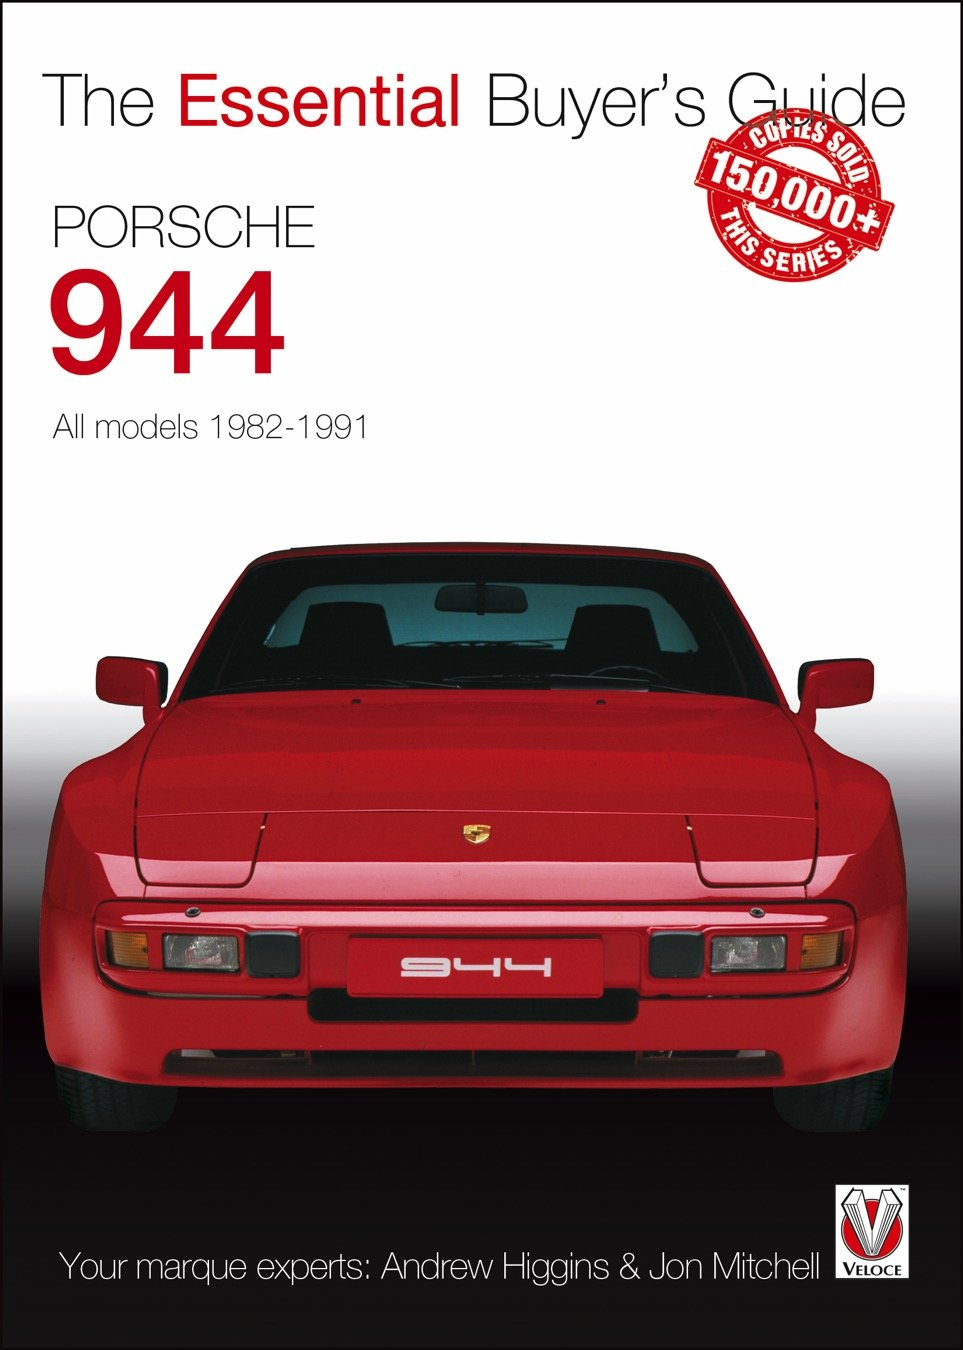 Porsche 944: All models 1982-1991 (Essential Buyer's Guide)